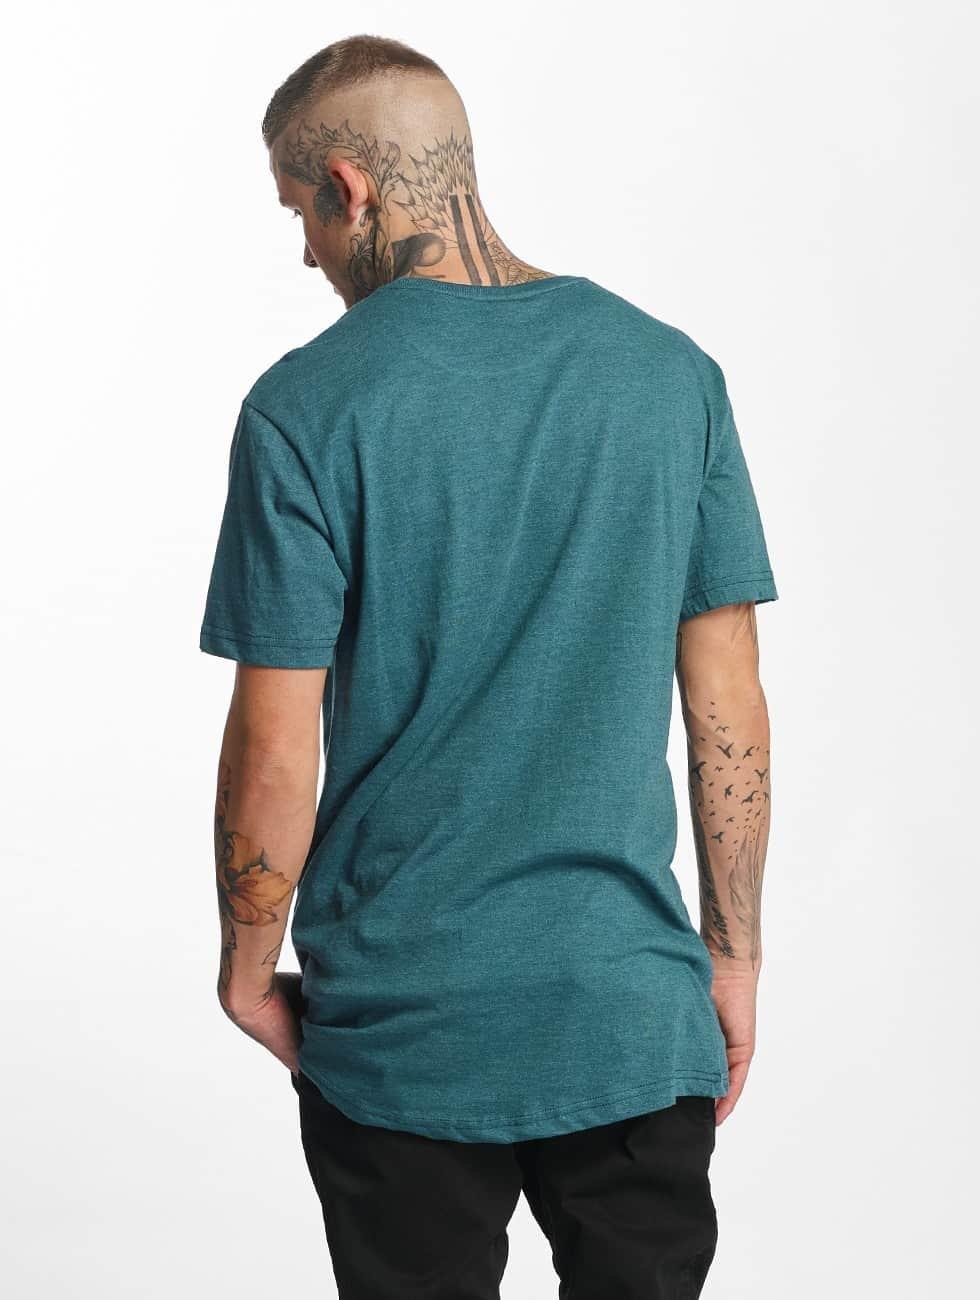 Urban Classics Tall Tees Shaped Melange Oversized Long turquois